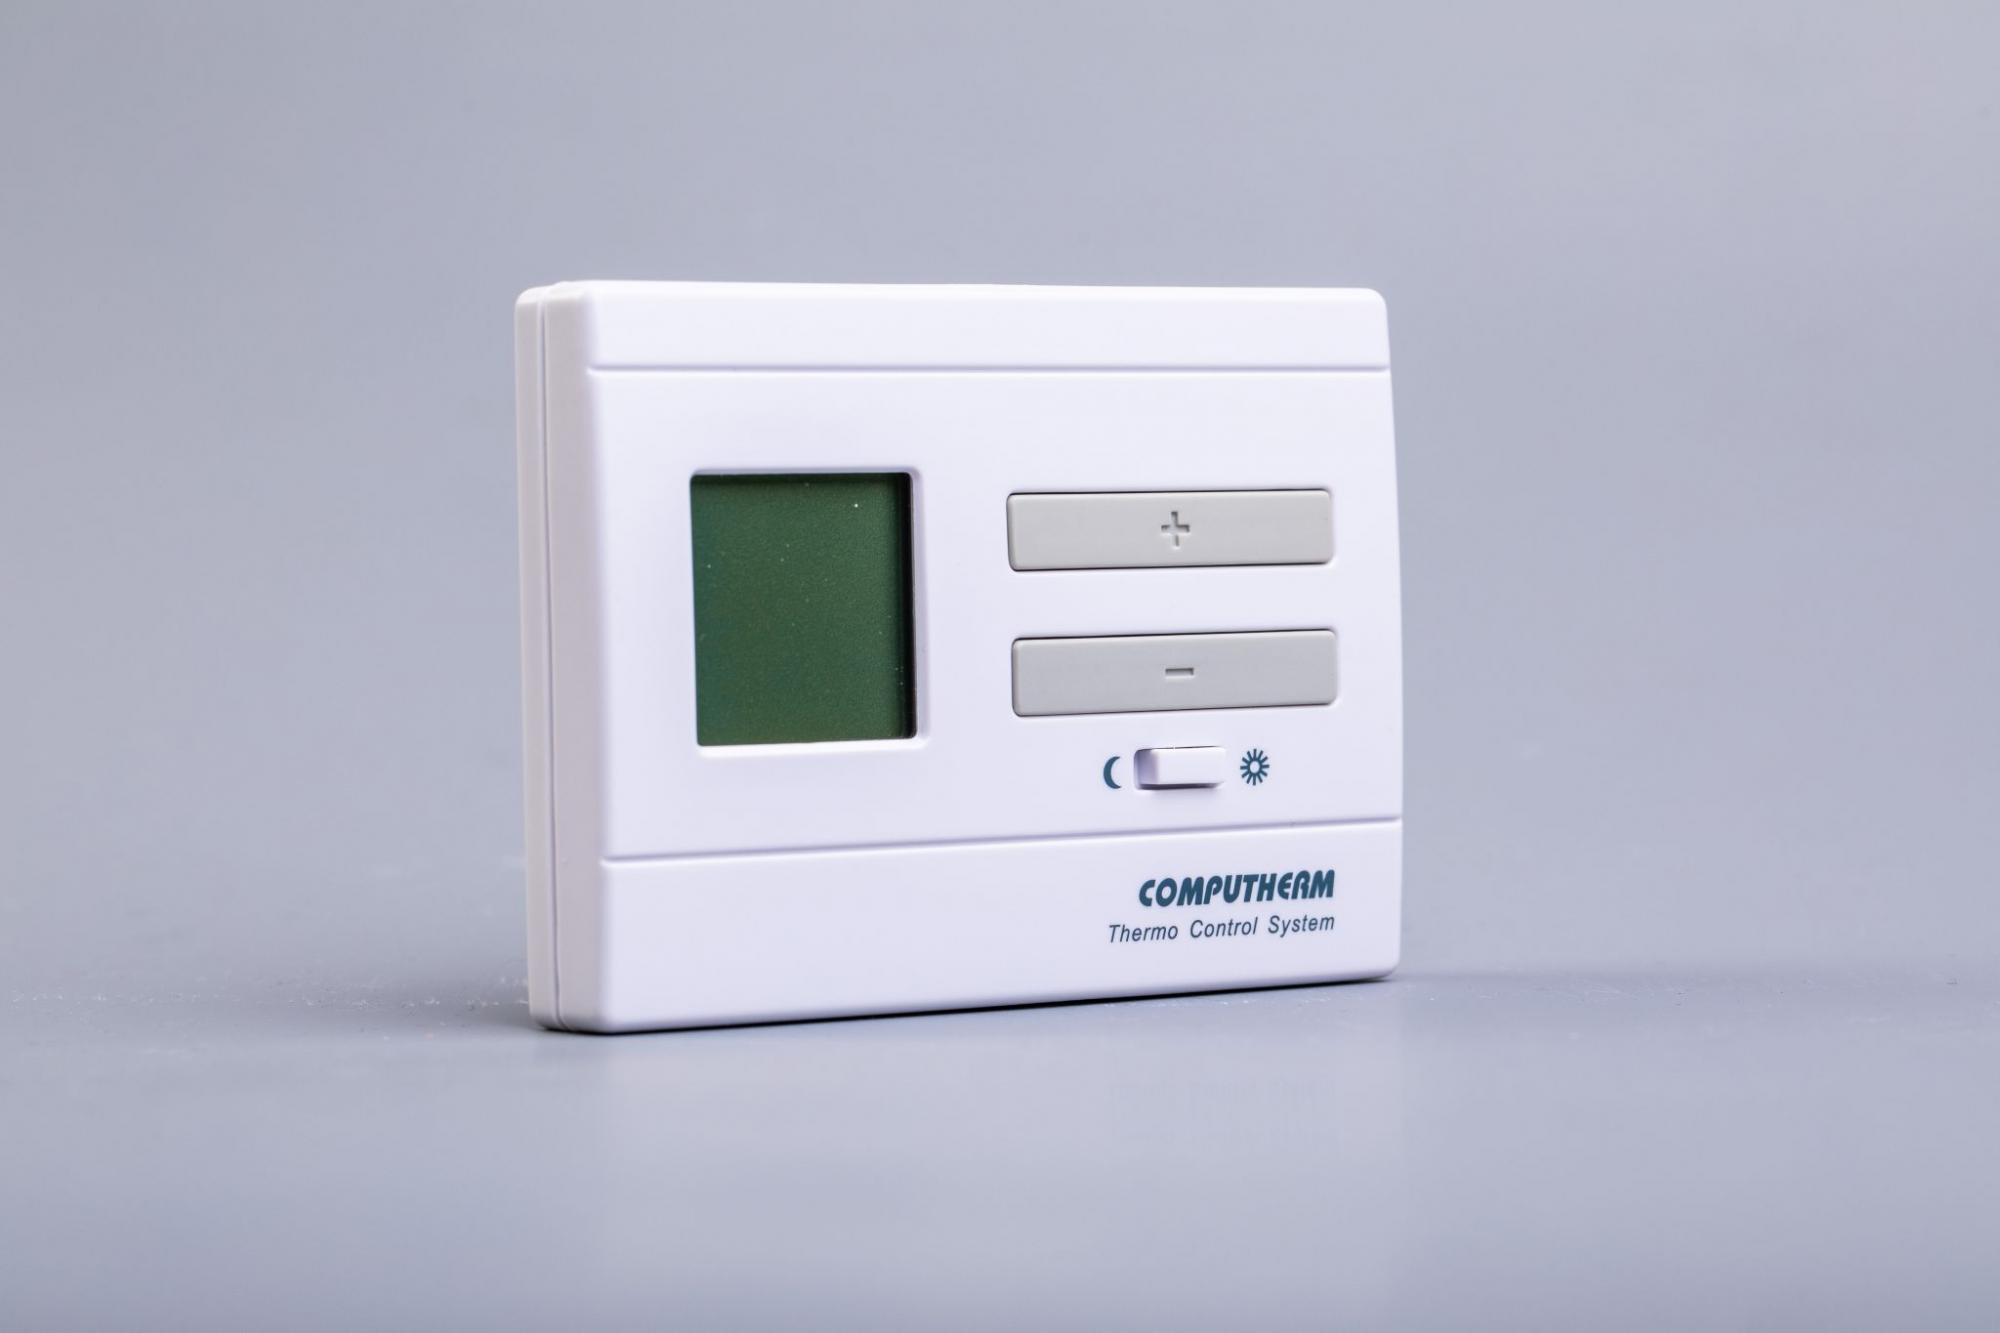 Computherm - Digitális termosztátok - COMPUTHERM Q3 - Quantrax Kft.